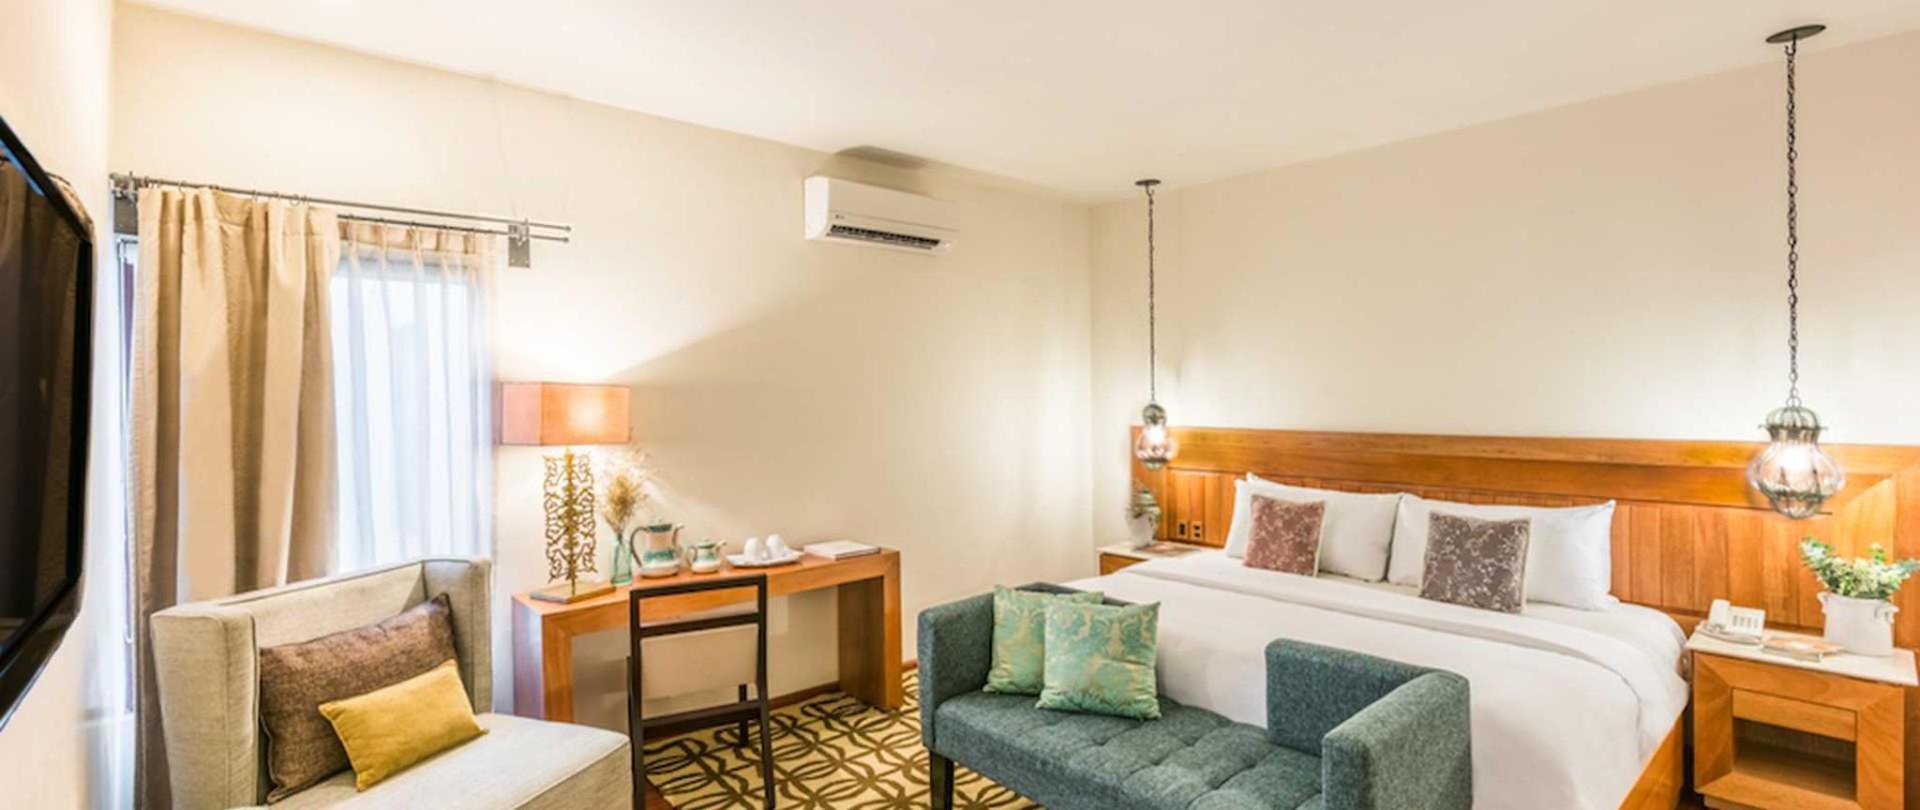 homepage-hotel-edelmira-guanajuato4.jpeg